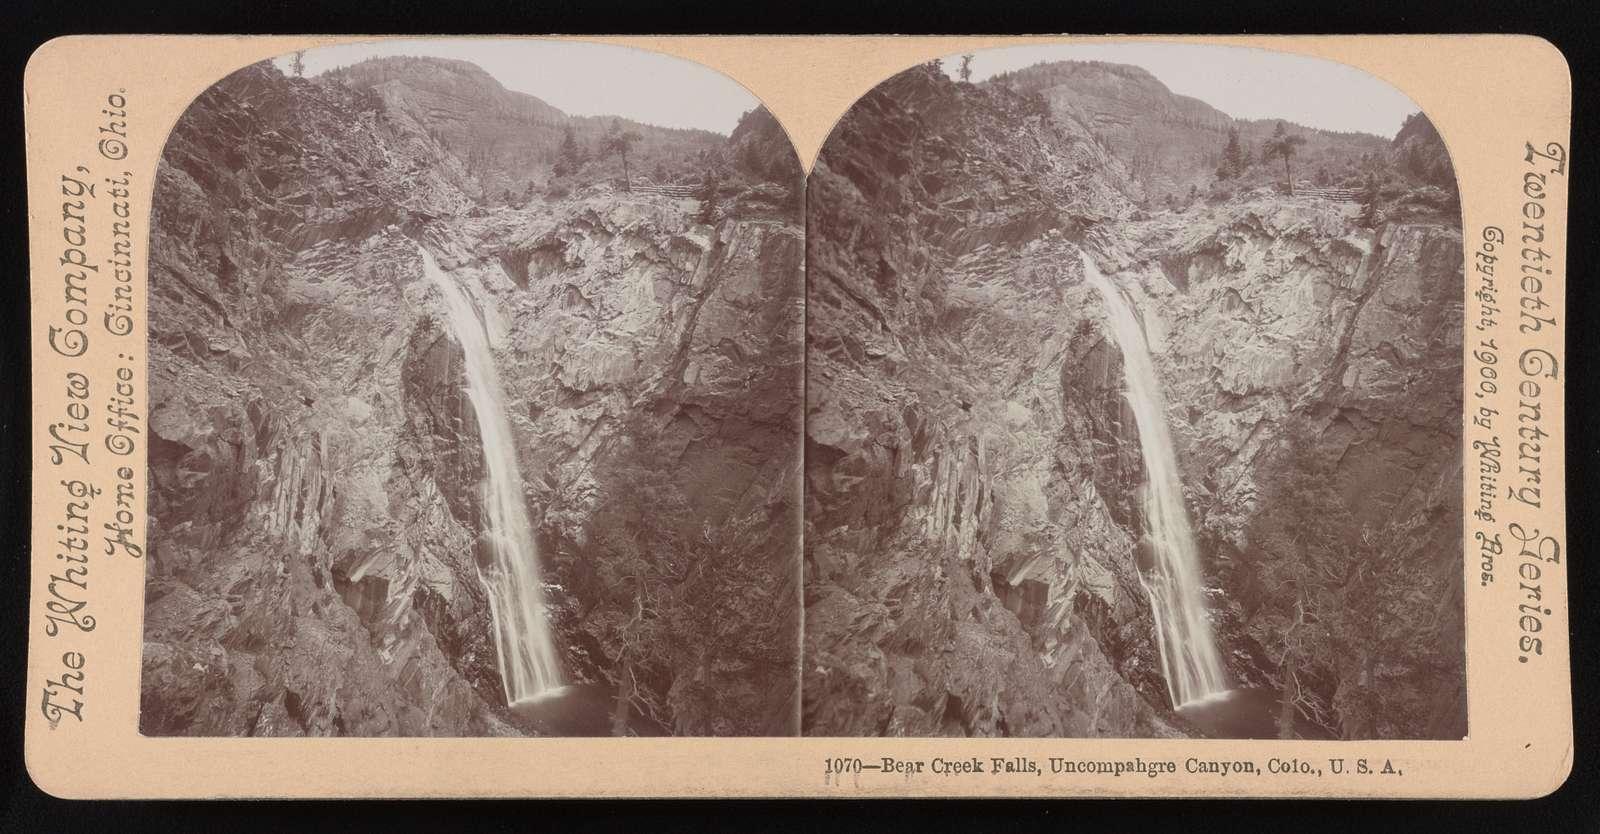 Bear Creek Falls, Uncompahgre Canyon, Colo., U.S.A